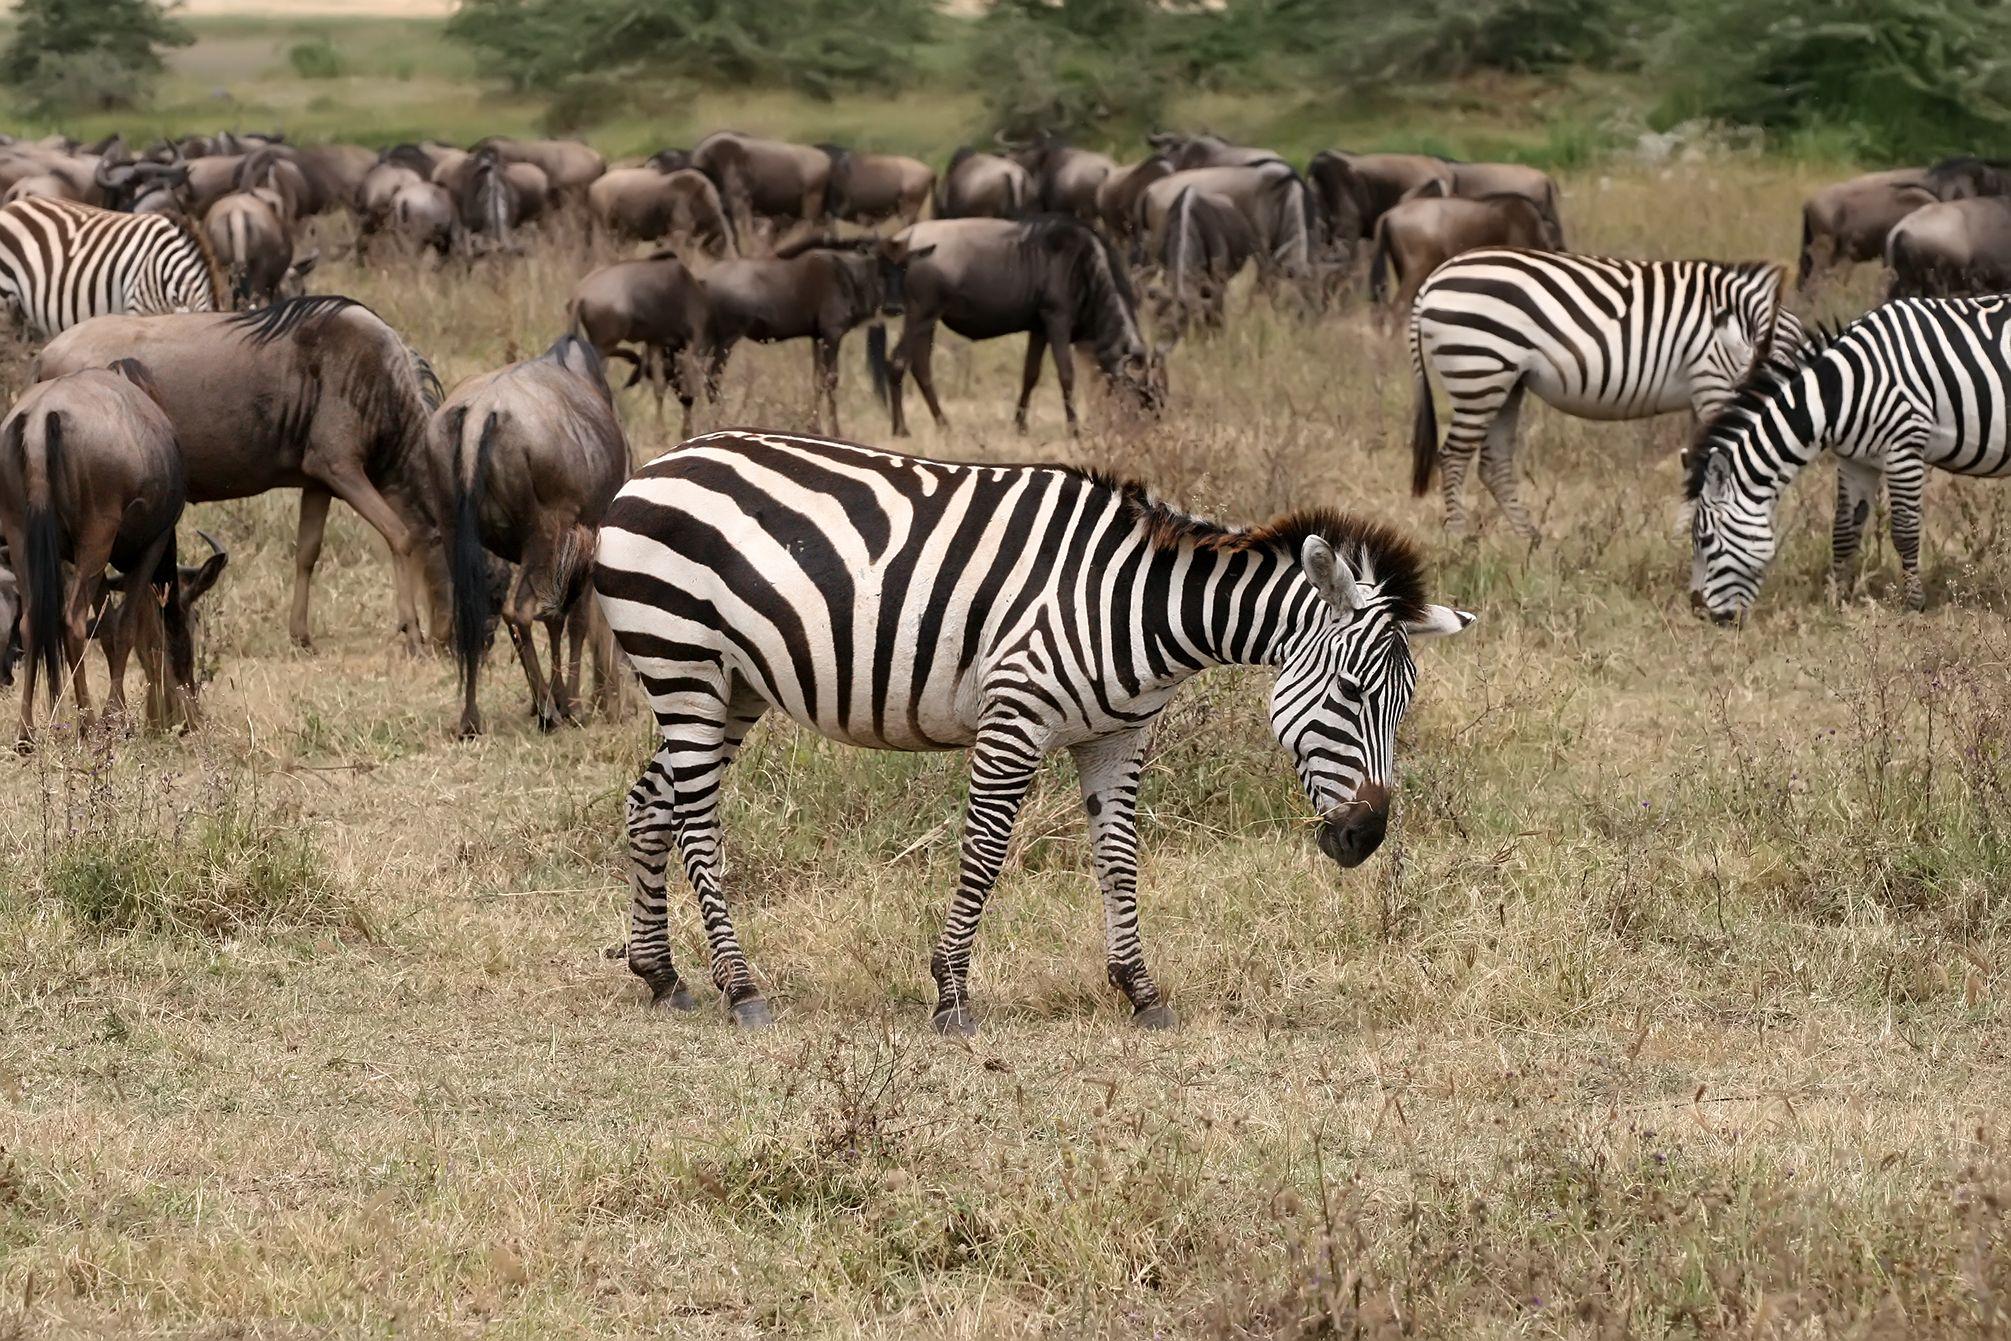 Zebras and wildebeests | File:Zebras and wildebeests, Ngorongoro.jpg - Wikipedia, the free ...